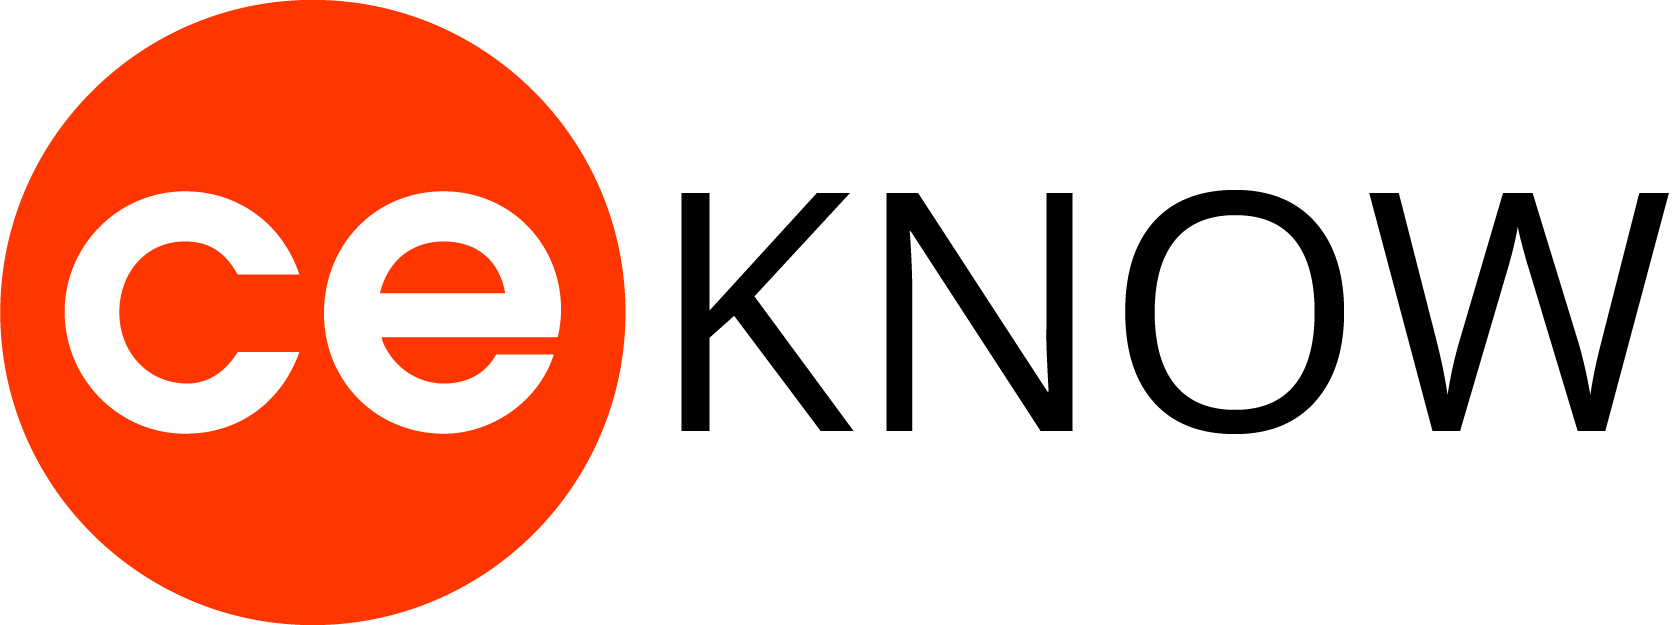 logo ceknow1